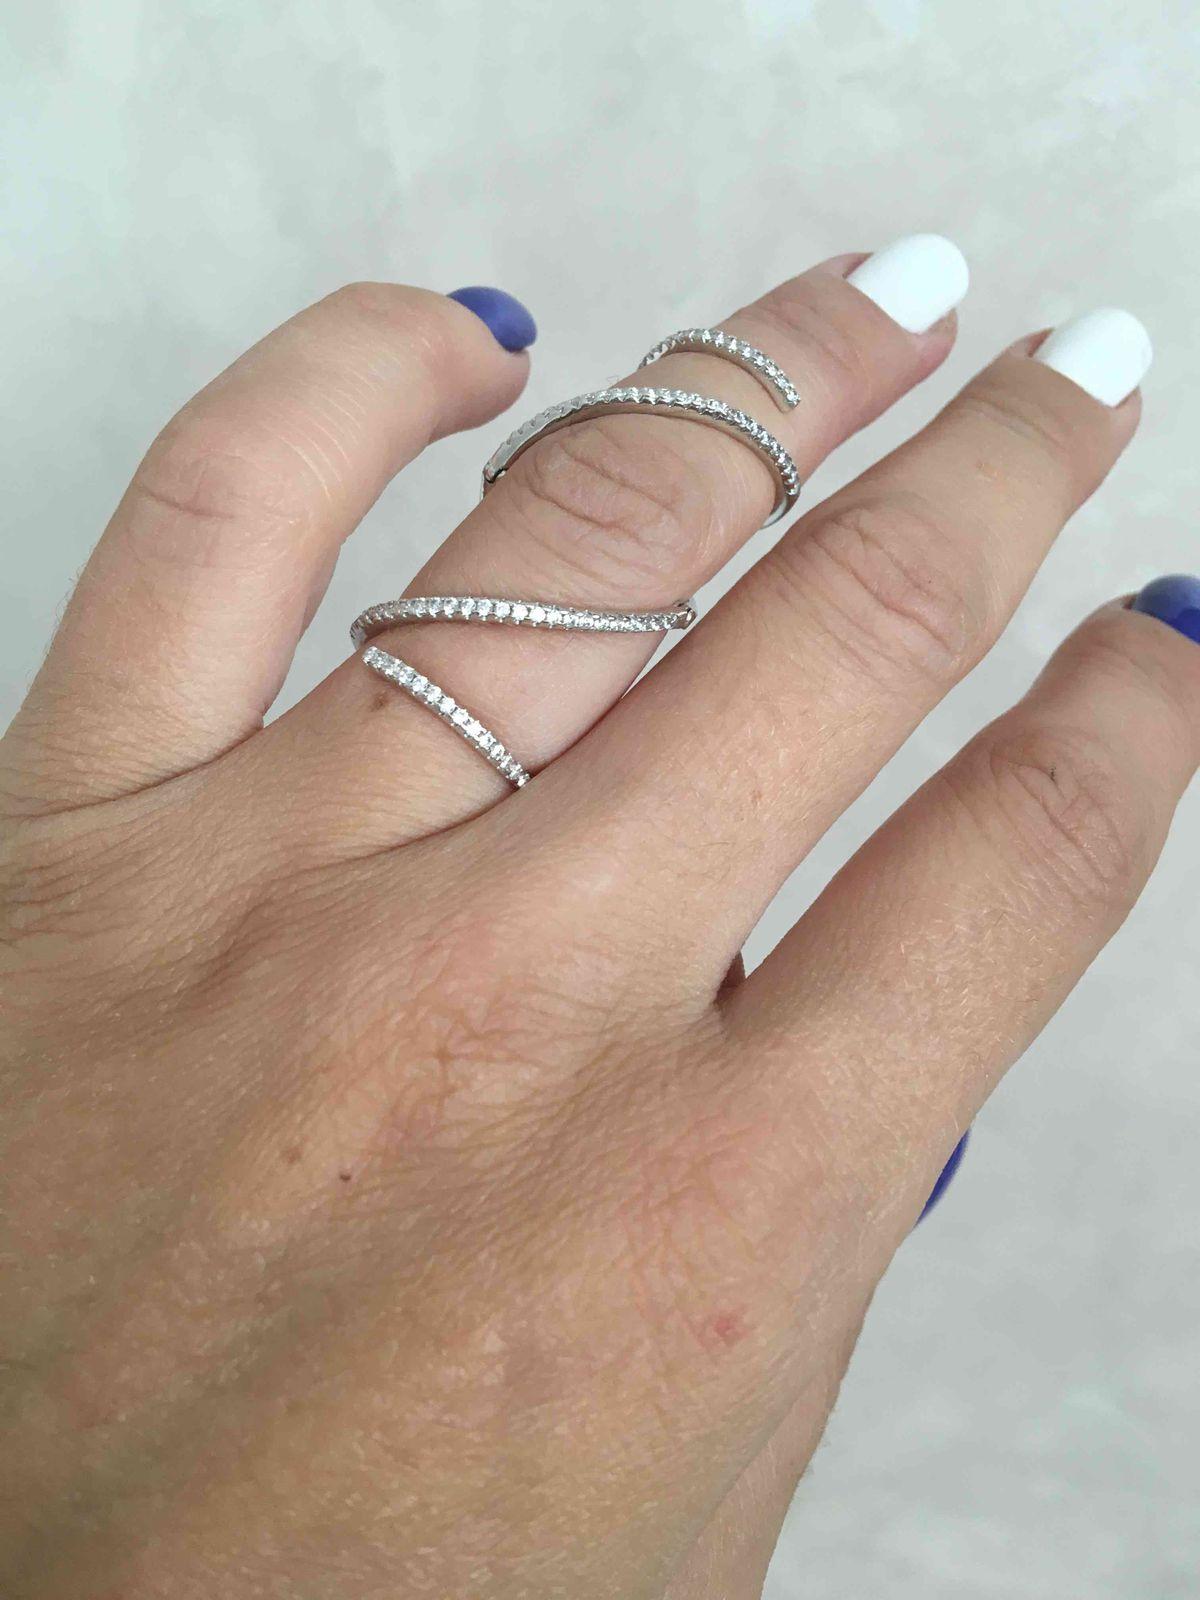 Кольцо крутяшное